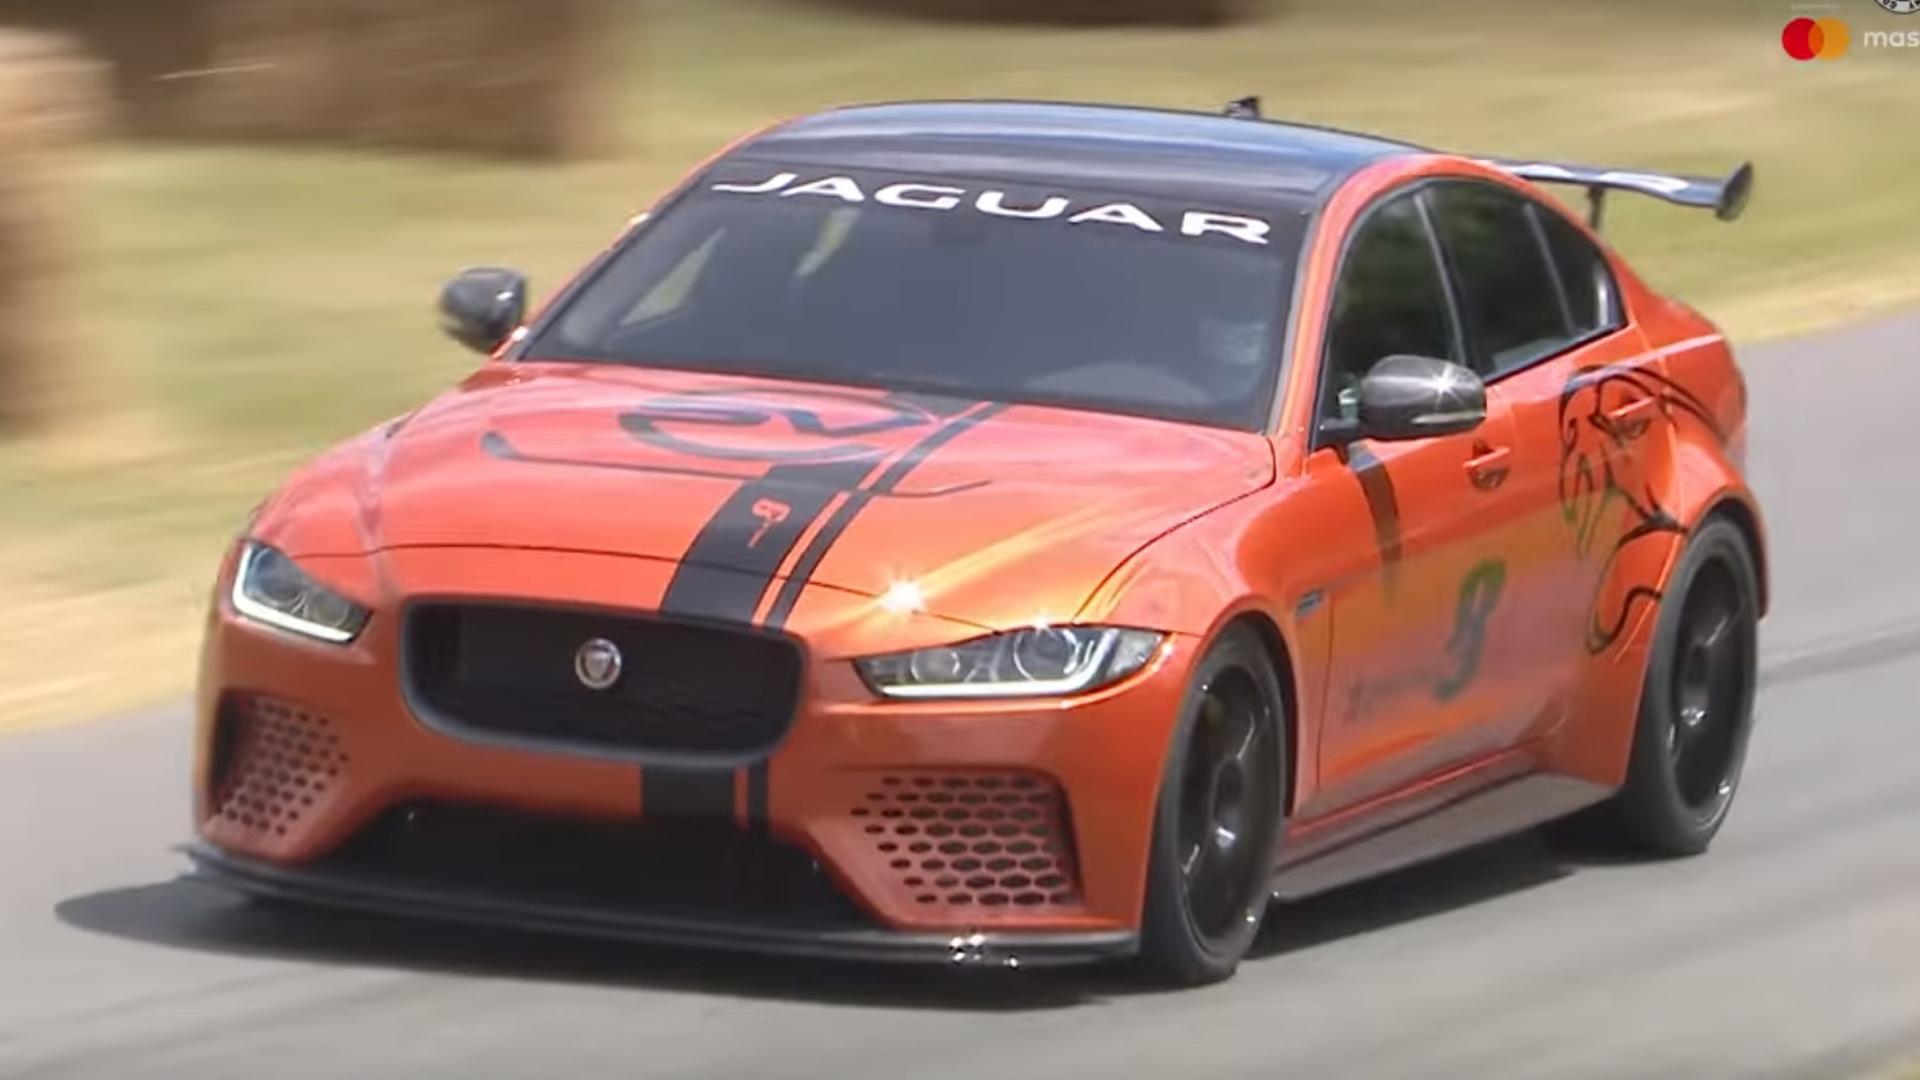 Jaguars Most Powerful Production Car Ever Attacks Goodwood - Goodwood hardware car show